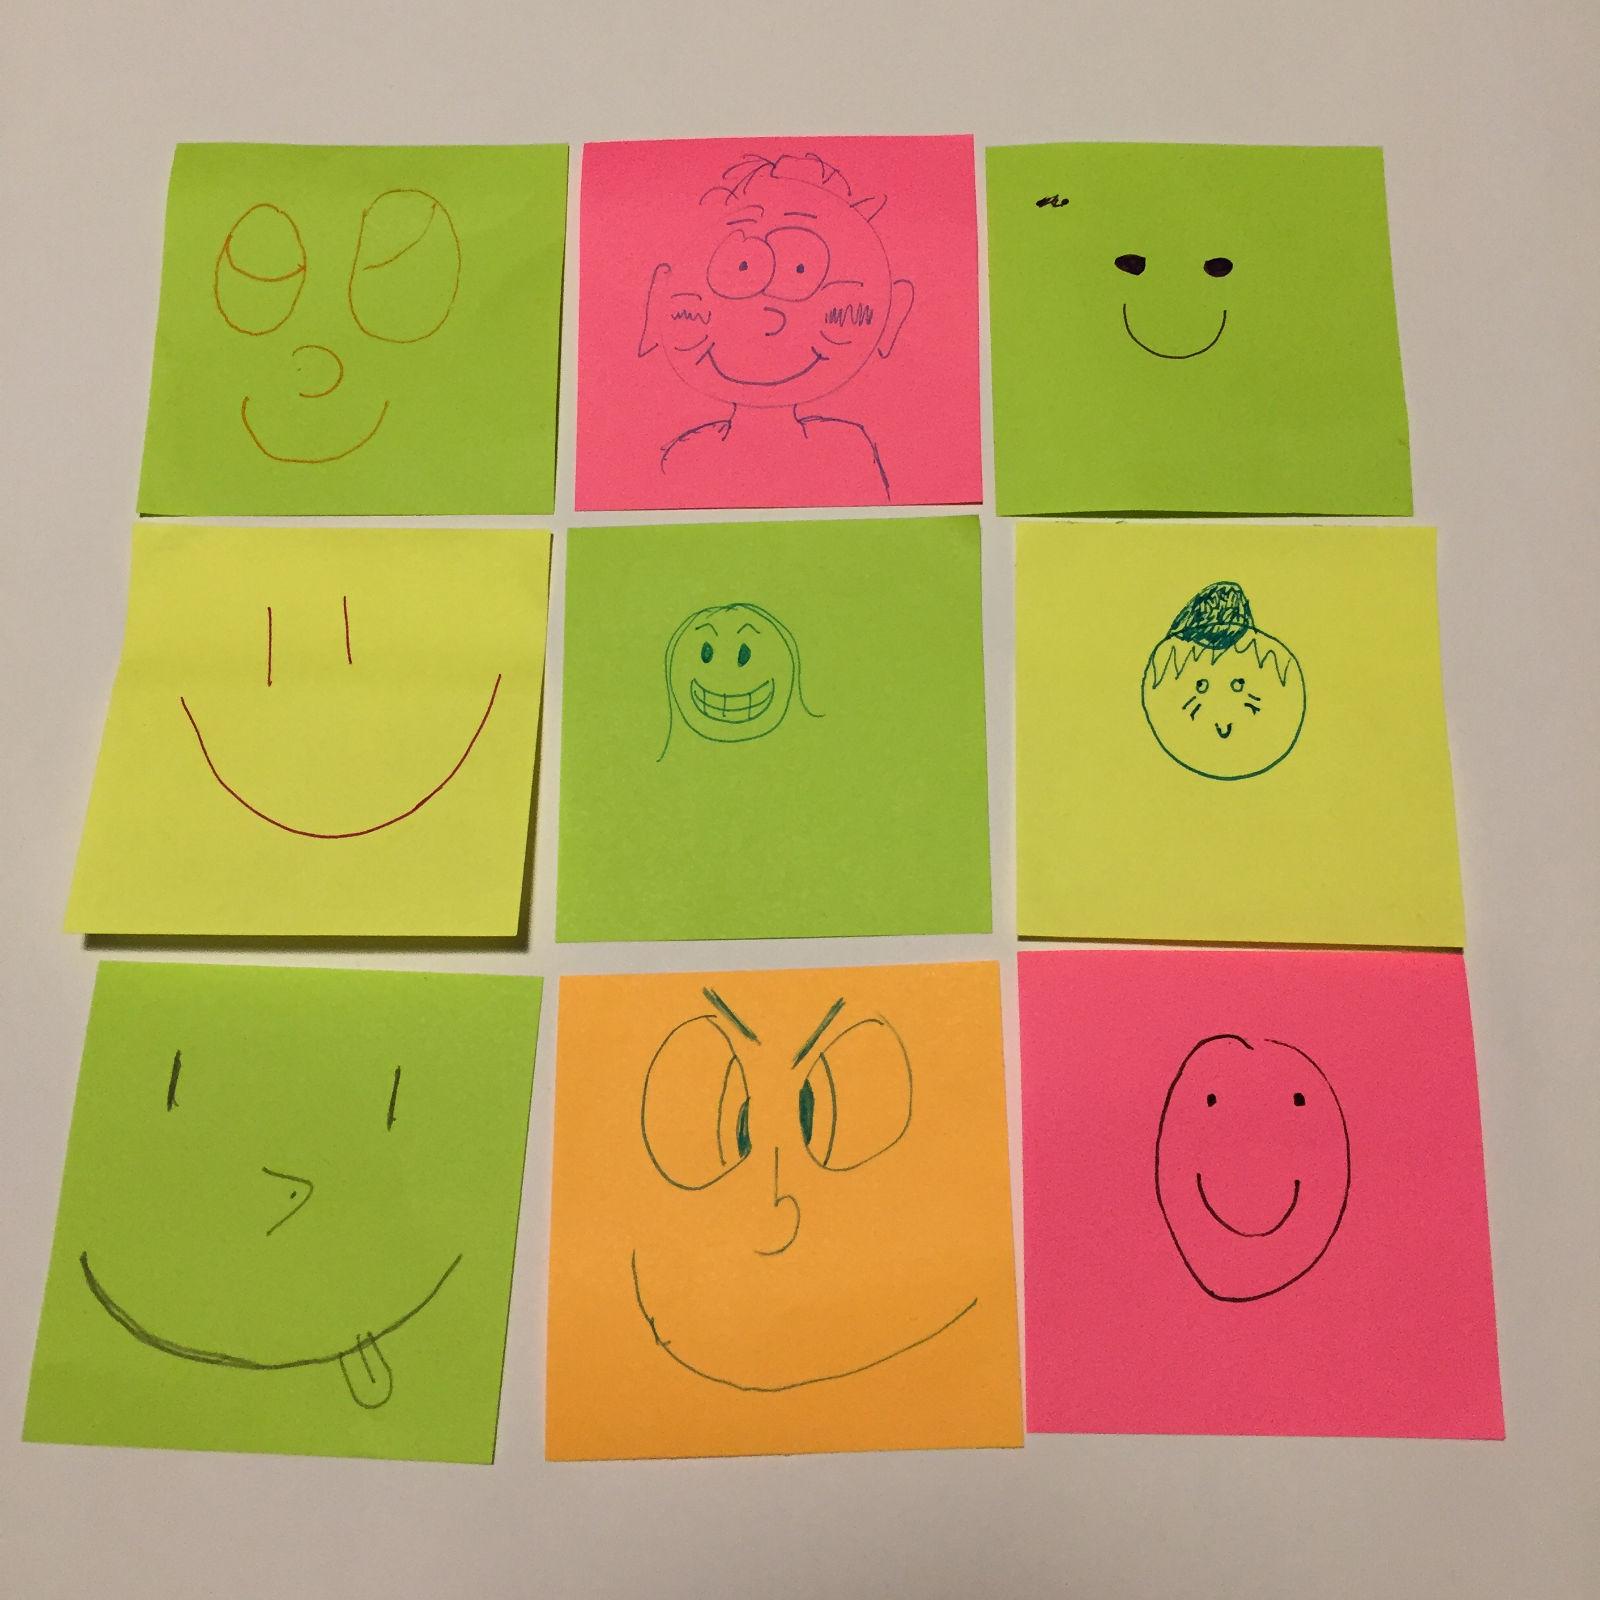 Resilience workshops in schools